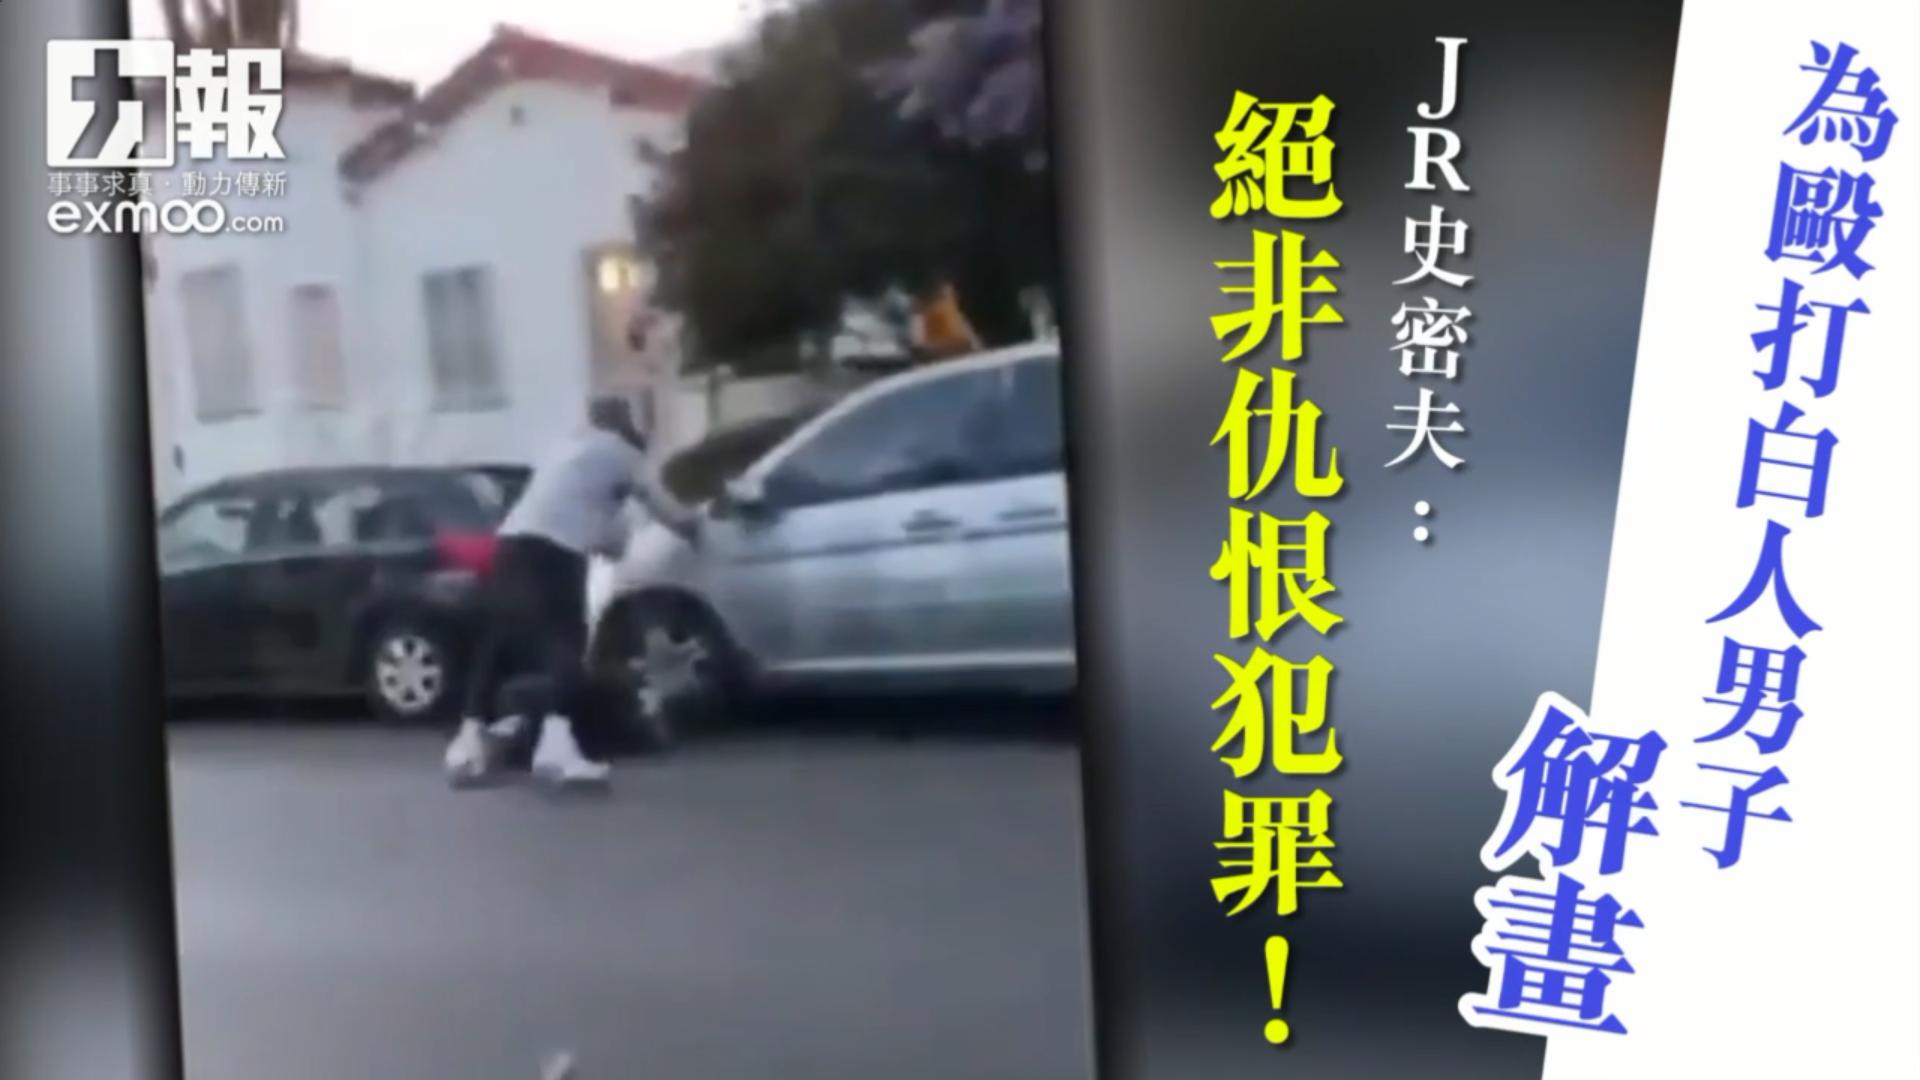 JR史密夫:絕非仇恨犯罪!